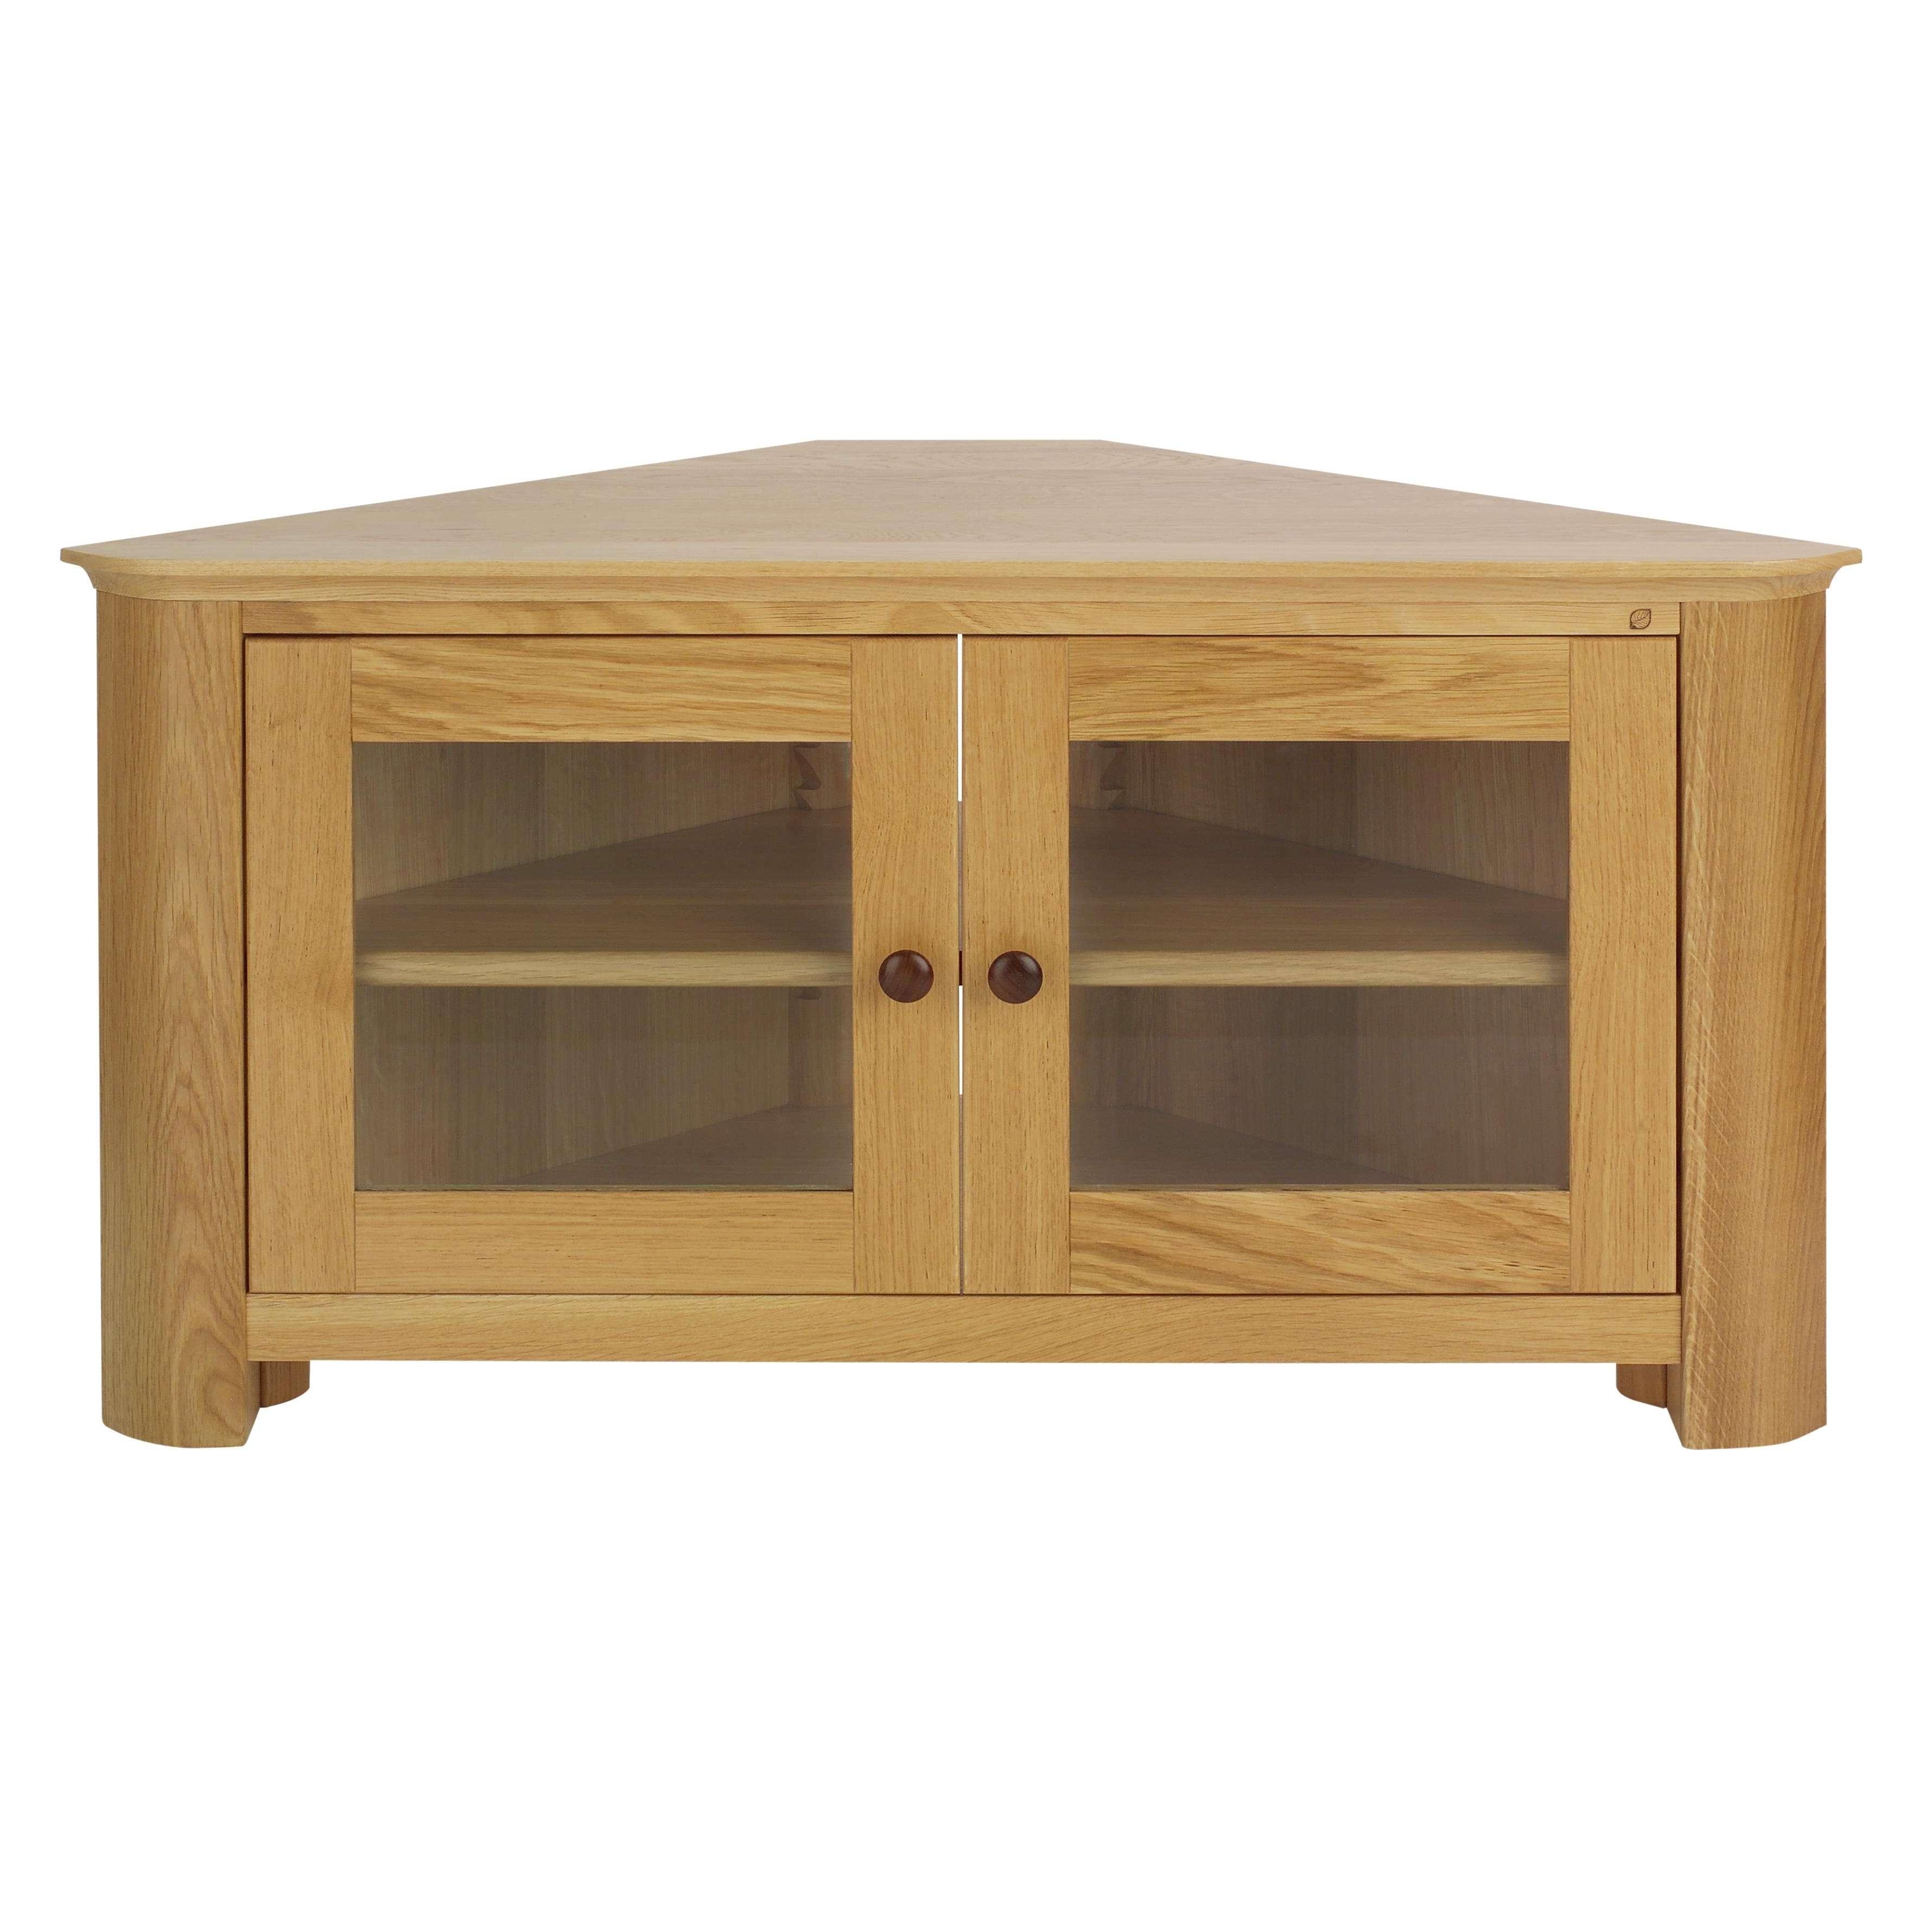 Corner Tv Cabinets With Glass Doors • Corner Cabinets Within Tv Cabinets With Glass Doors (View 2 of 20)